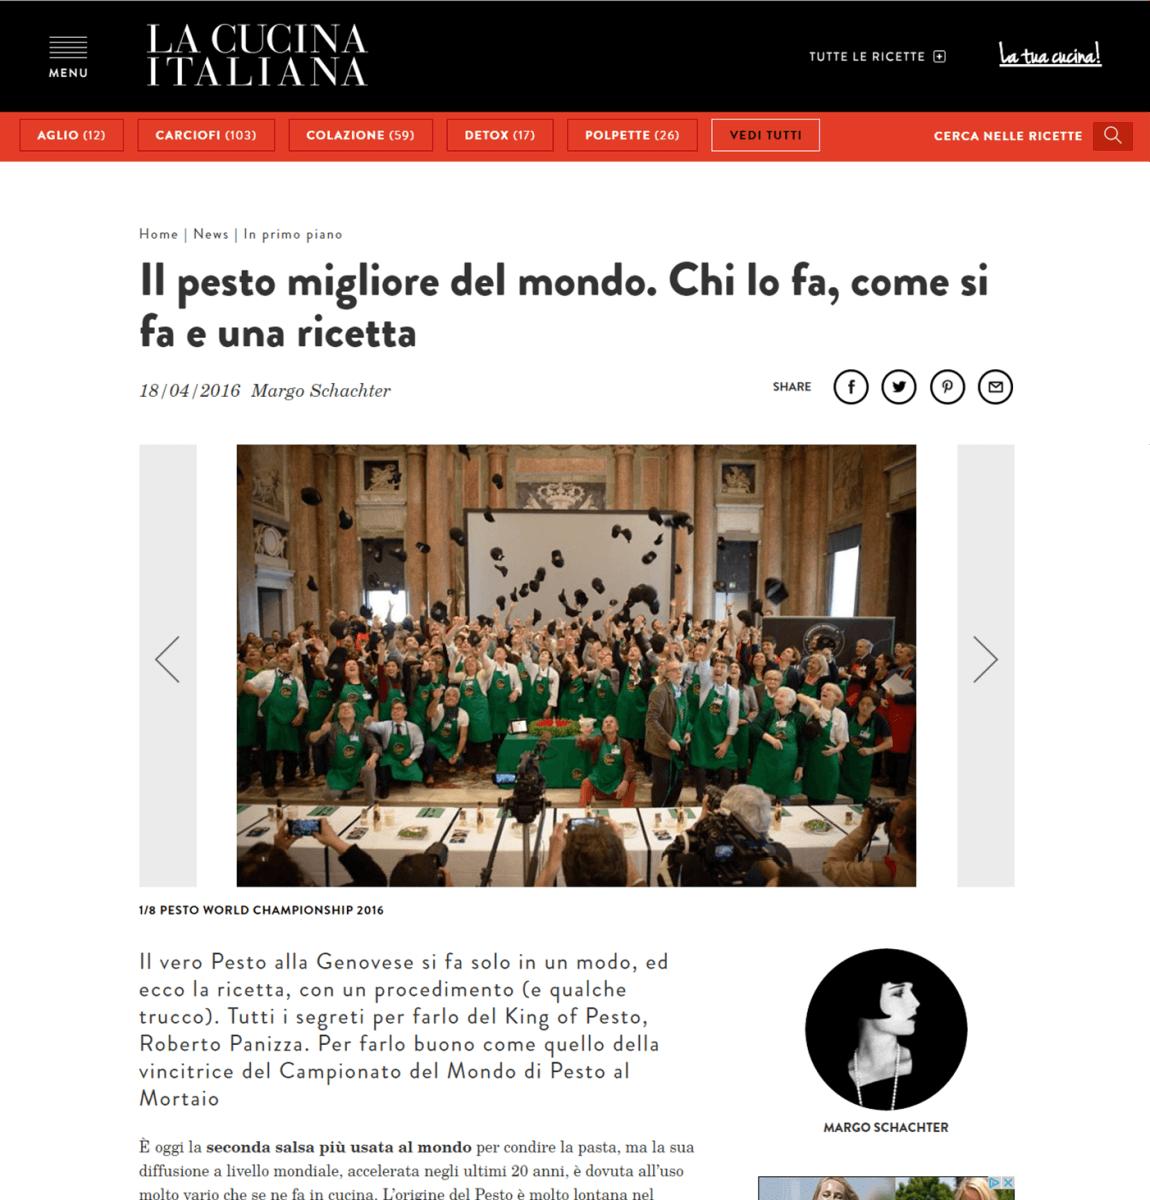 La Cucina Italiana - 18 Aprile 2016